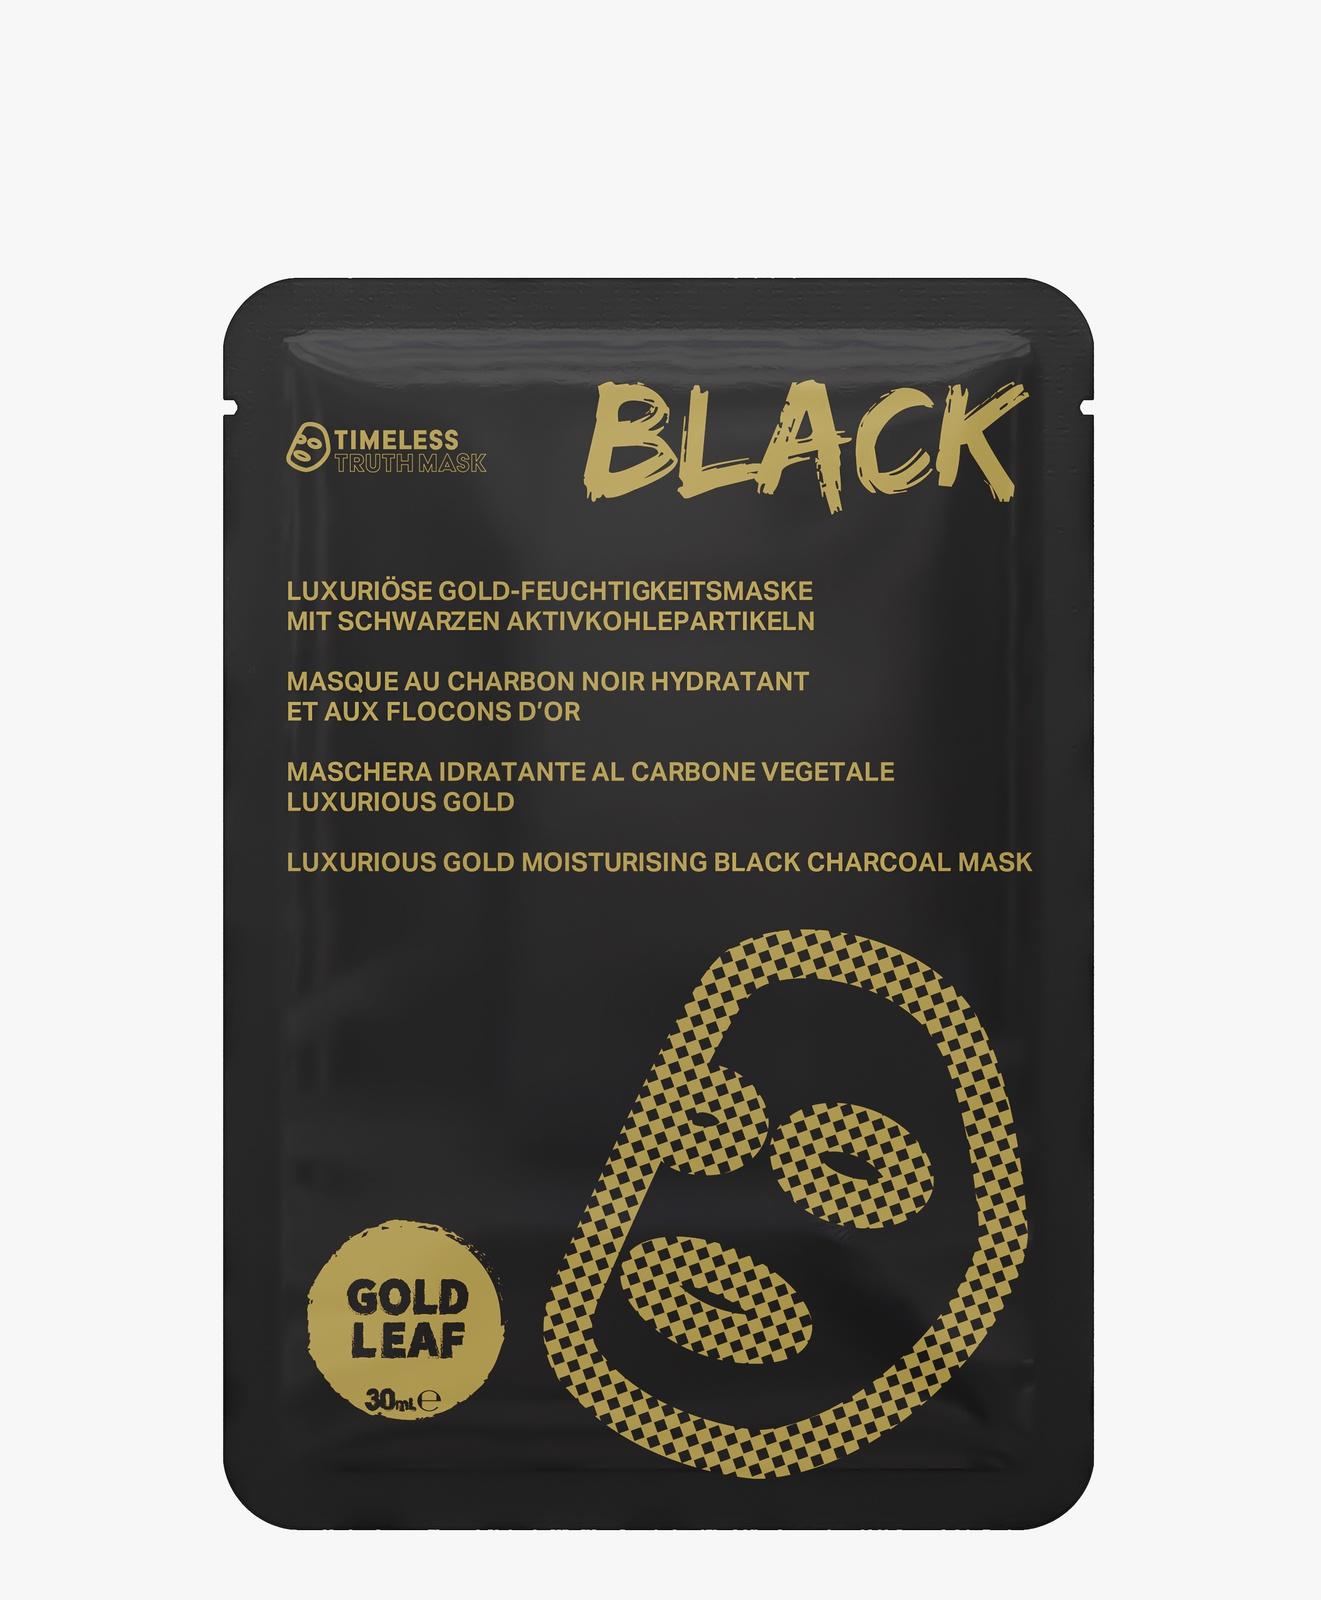 Timeless Truth Mask Black